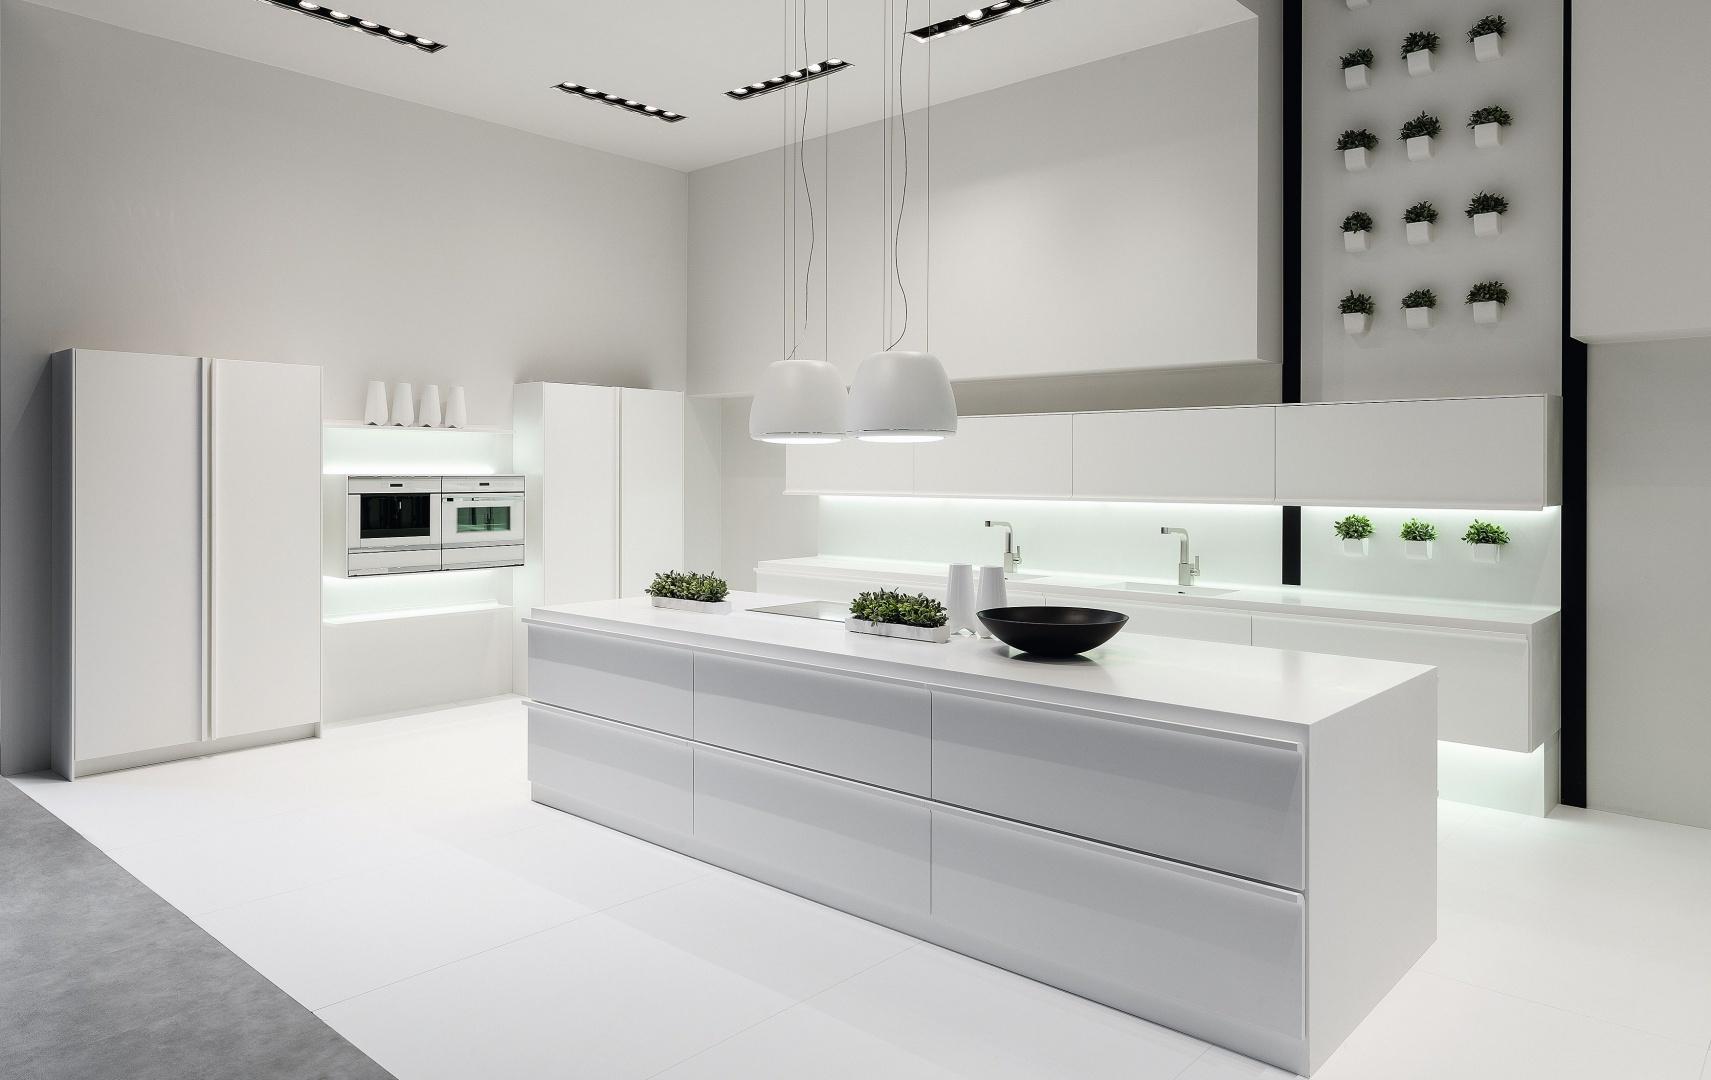 Kuchnia Floo, projekt Karim Rashid. Fot. Rational